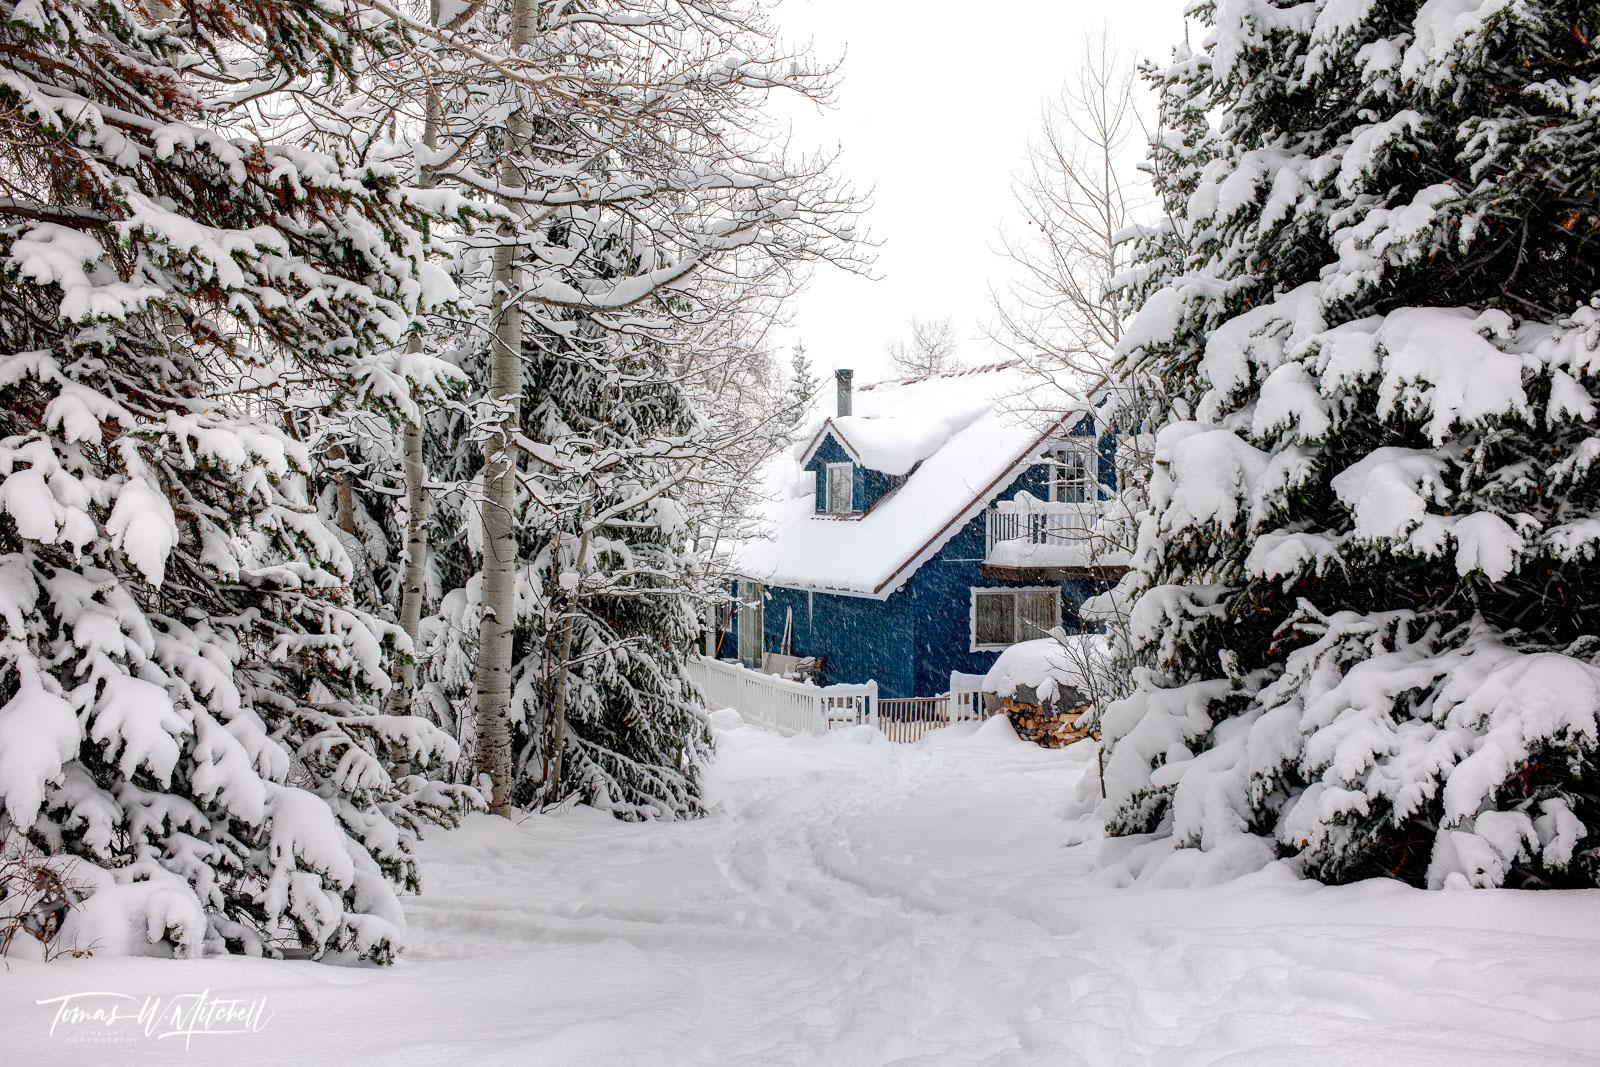 limited edition, fine art, prints, oakley utah, snowed inn, cottage, cabin, photograph, snow, blue, skis, snowflakes, storm, winter, trees, , photo